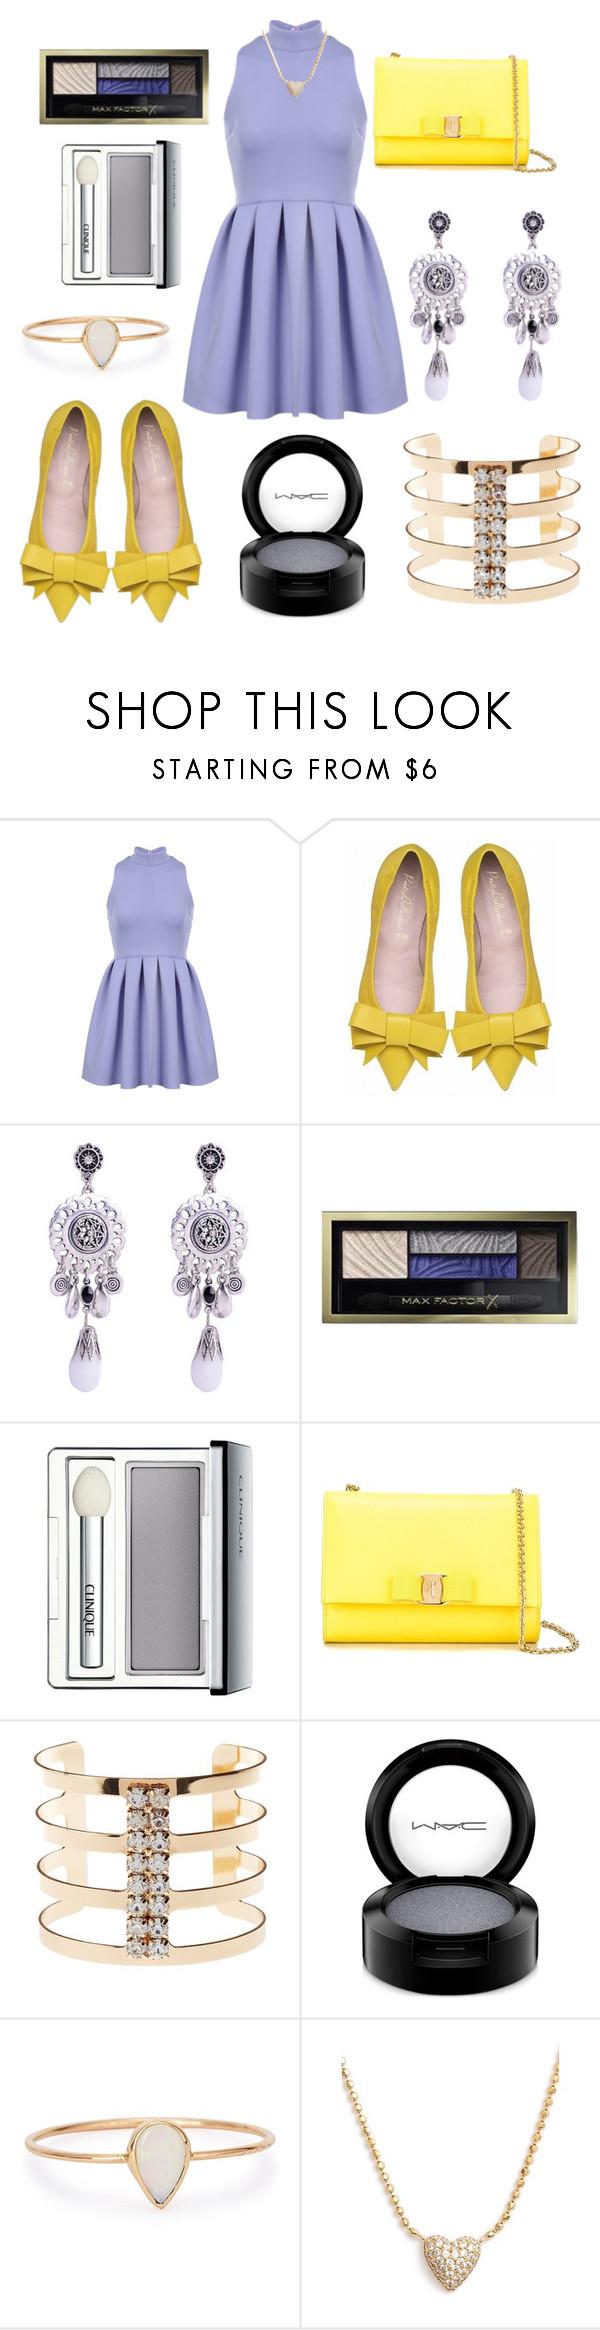 """Cute Dress"" by josie1289 ❤ liked on Polyvore featuring moda, Max Factor, Clinique, Salvatore Ferragamo, Charlotte Russe, MAC Cosmetics, Catbird e Nadri"